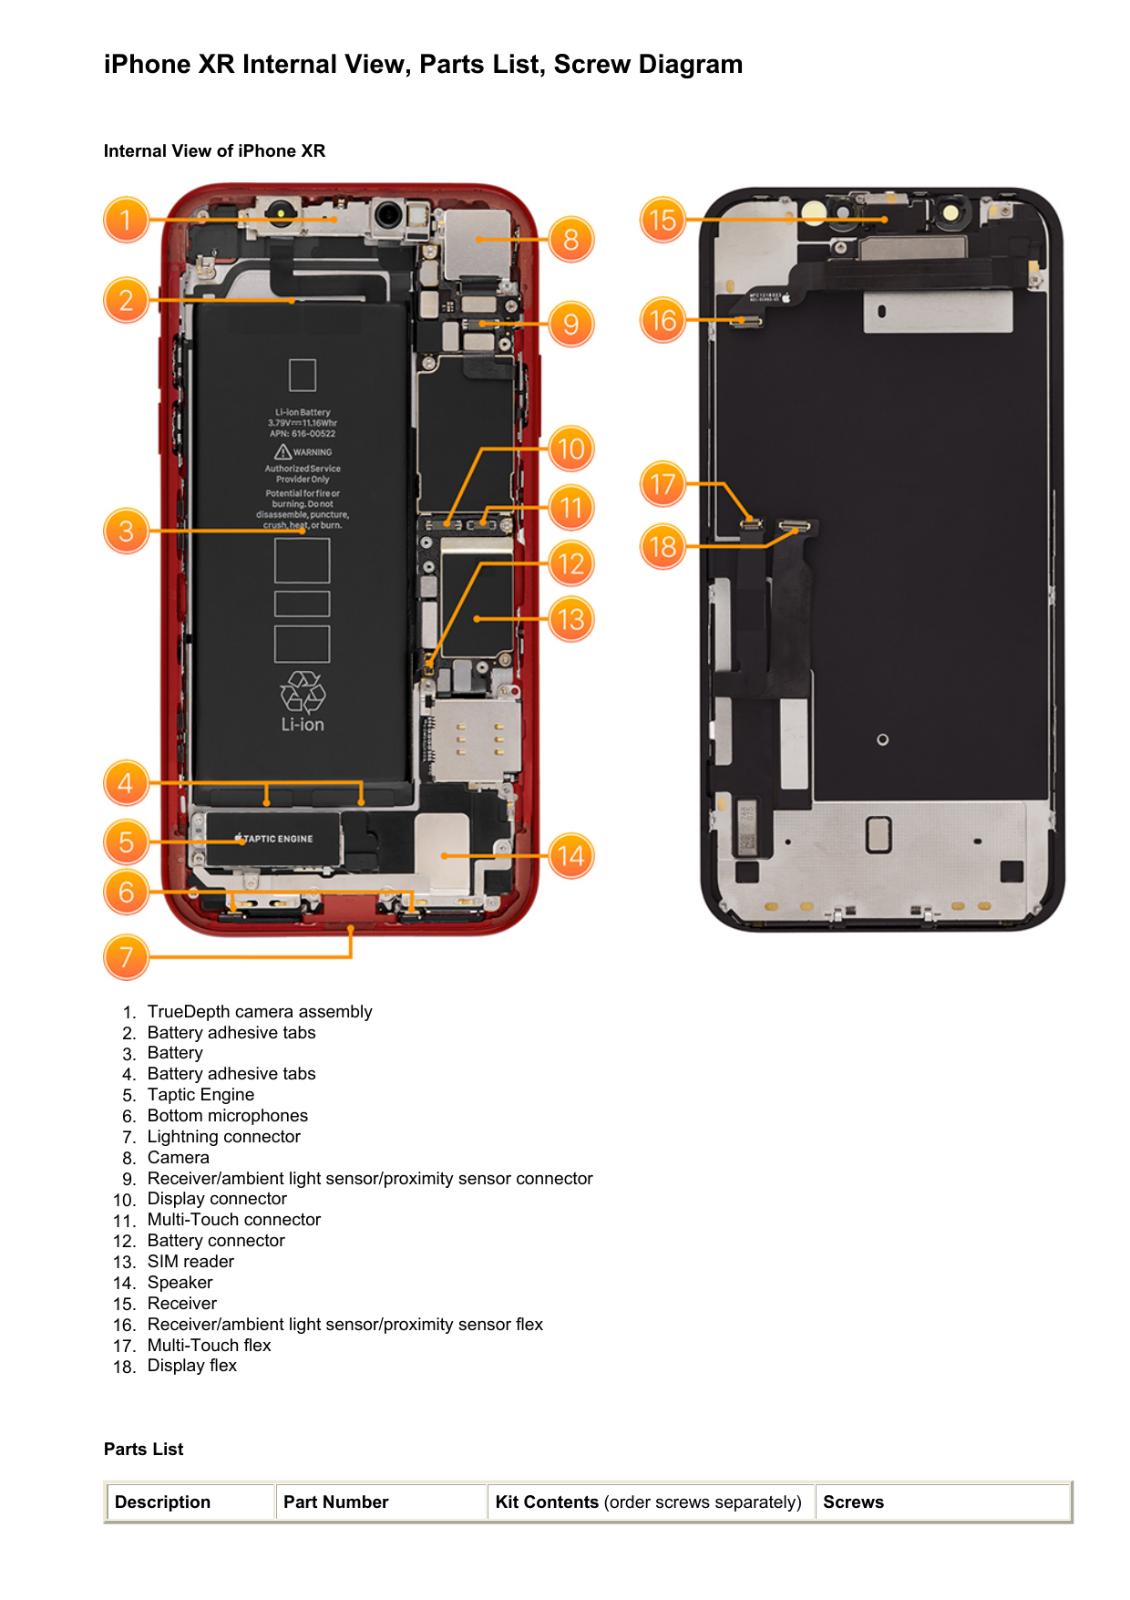 как выглядит Apple iPhone XR Technician Guide Service Manual фото